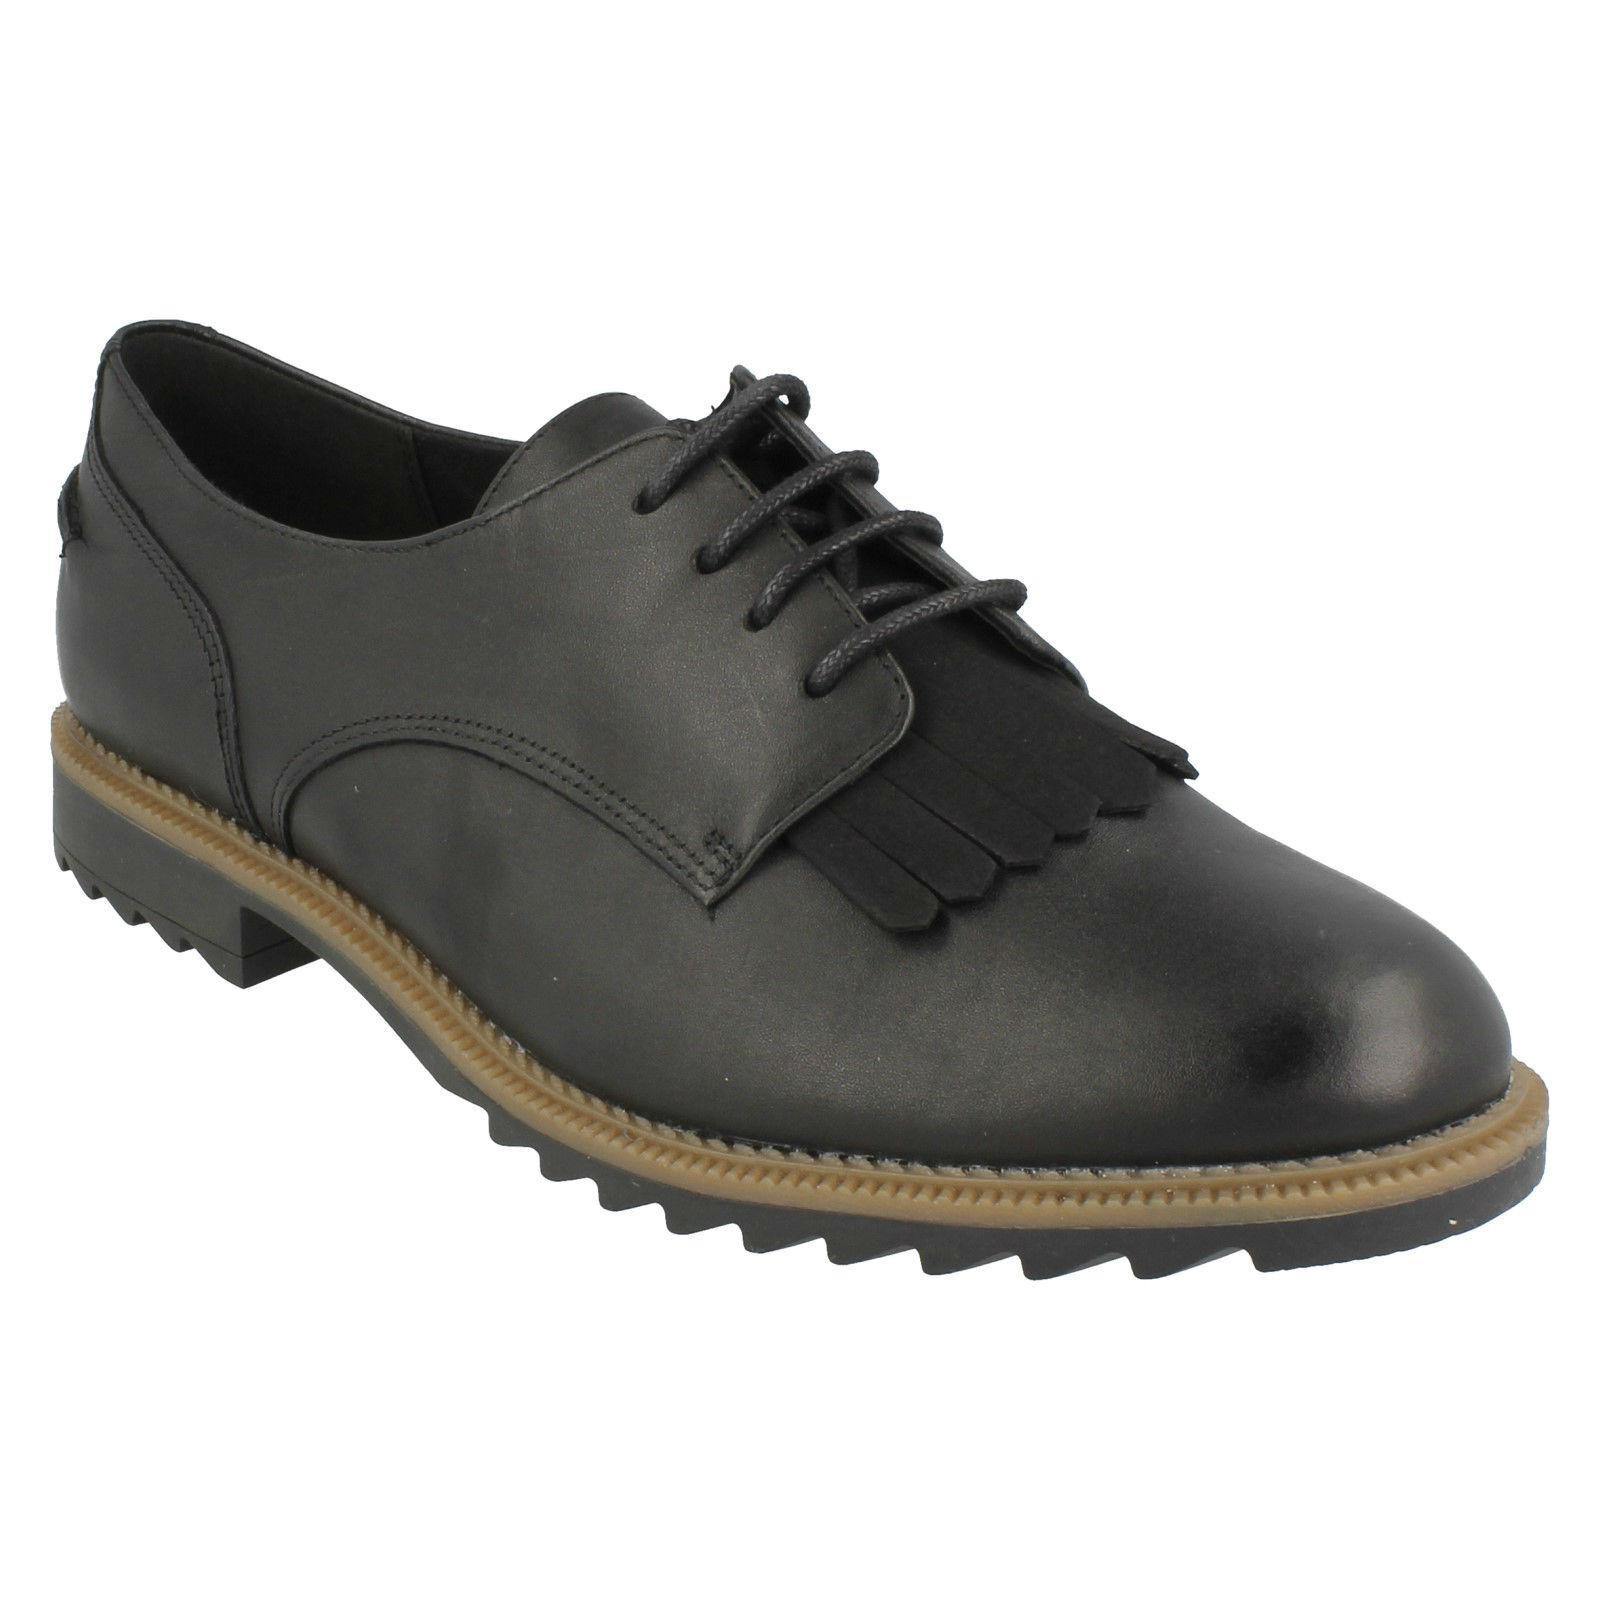 Greifen Mabel Damen Clarks Fransen Leder Velours Brogue Schnürbar Fransen Clarks Smart Schuhe 76a6c8